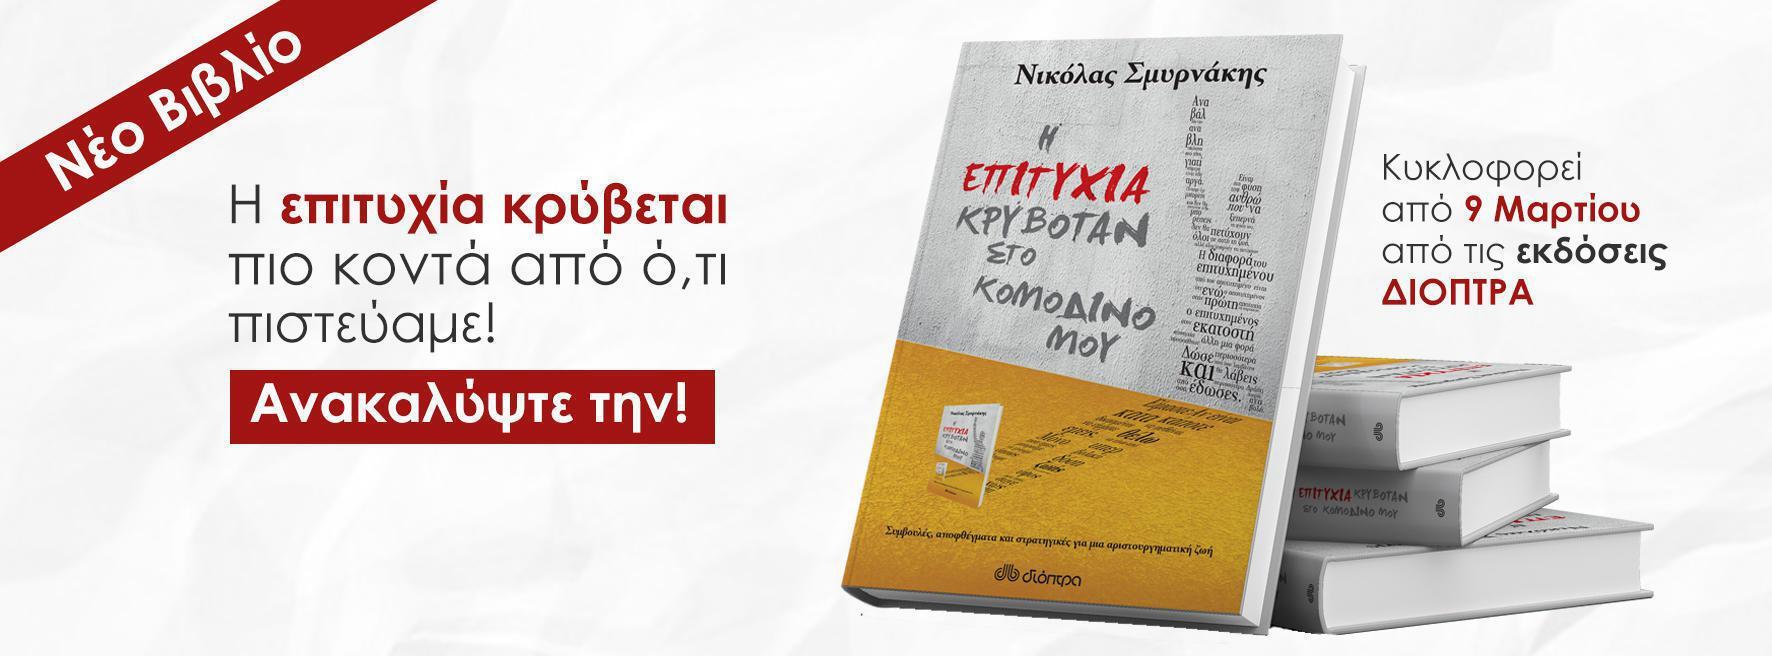 island_book_2016